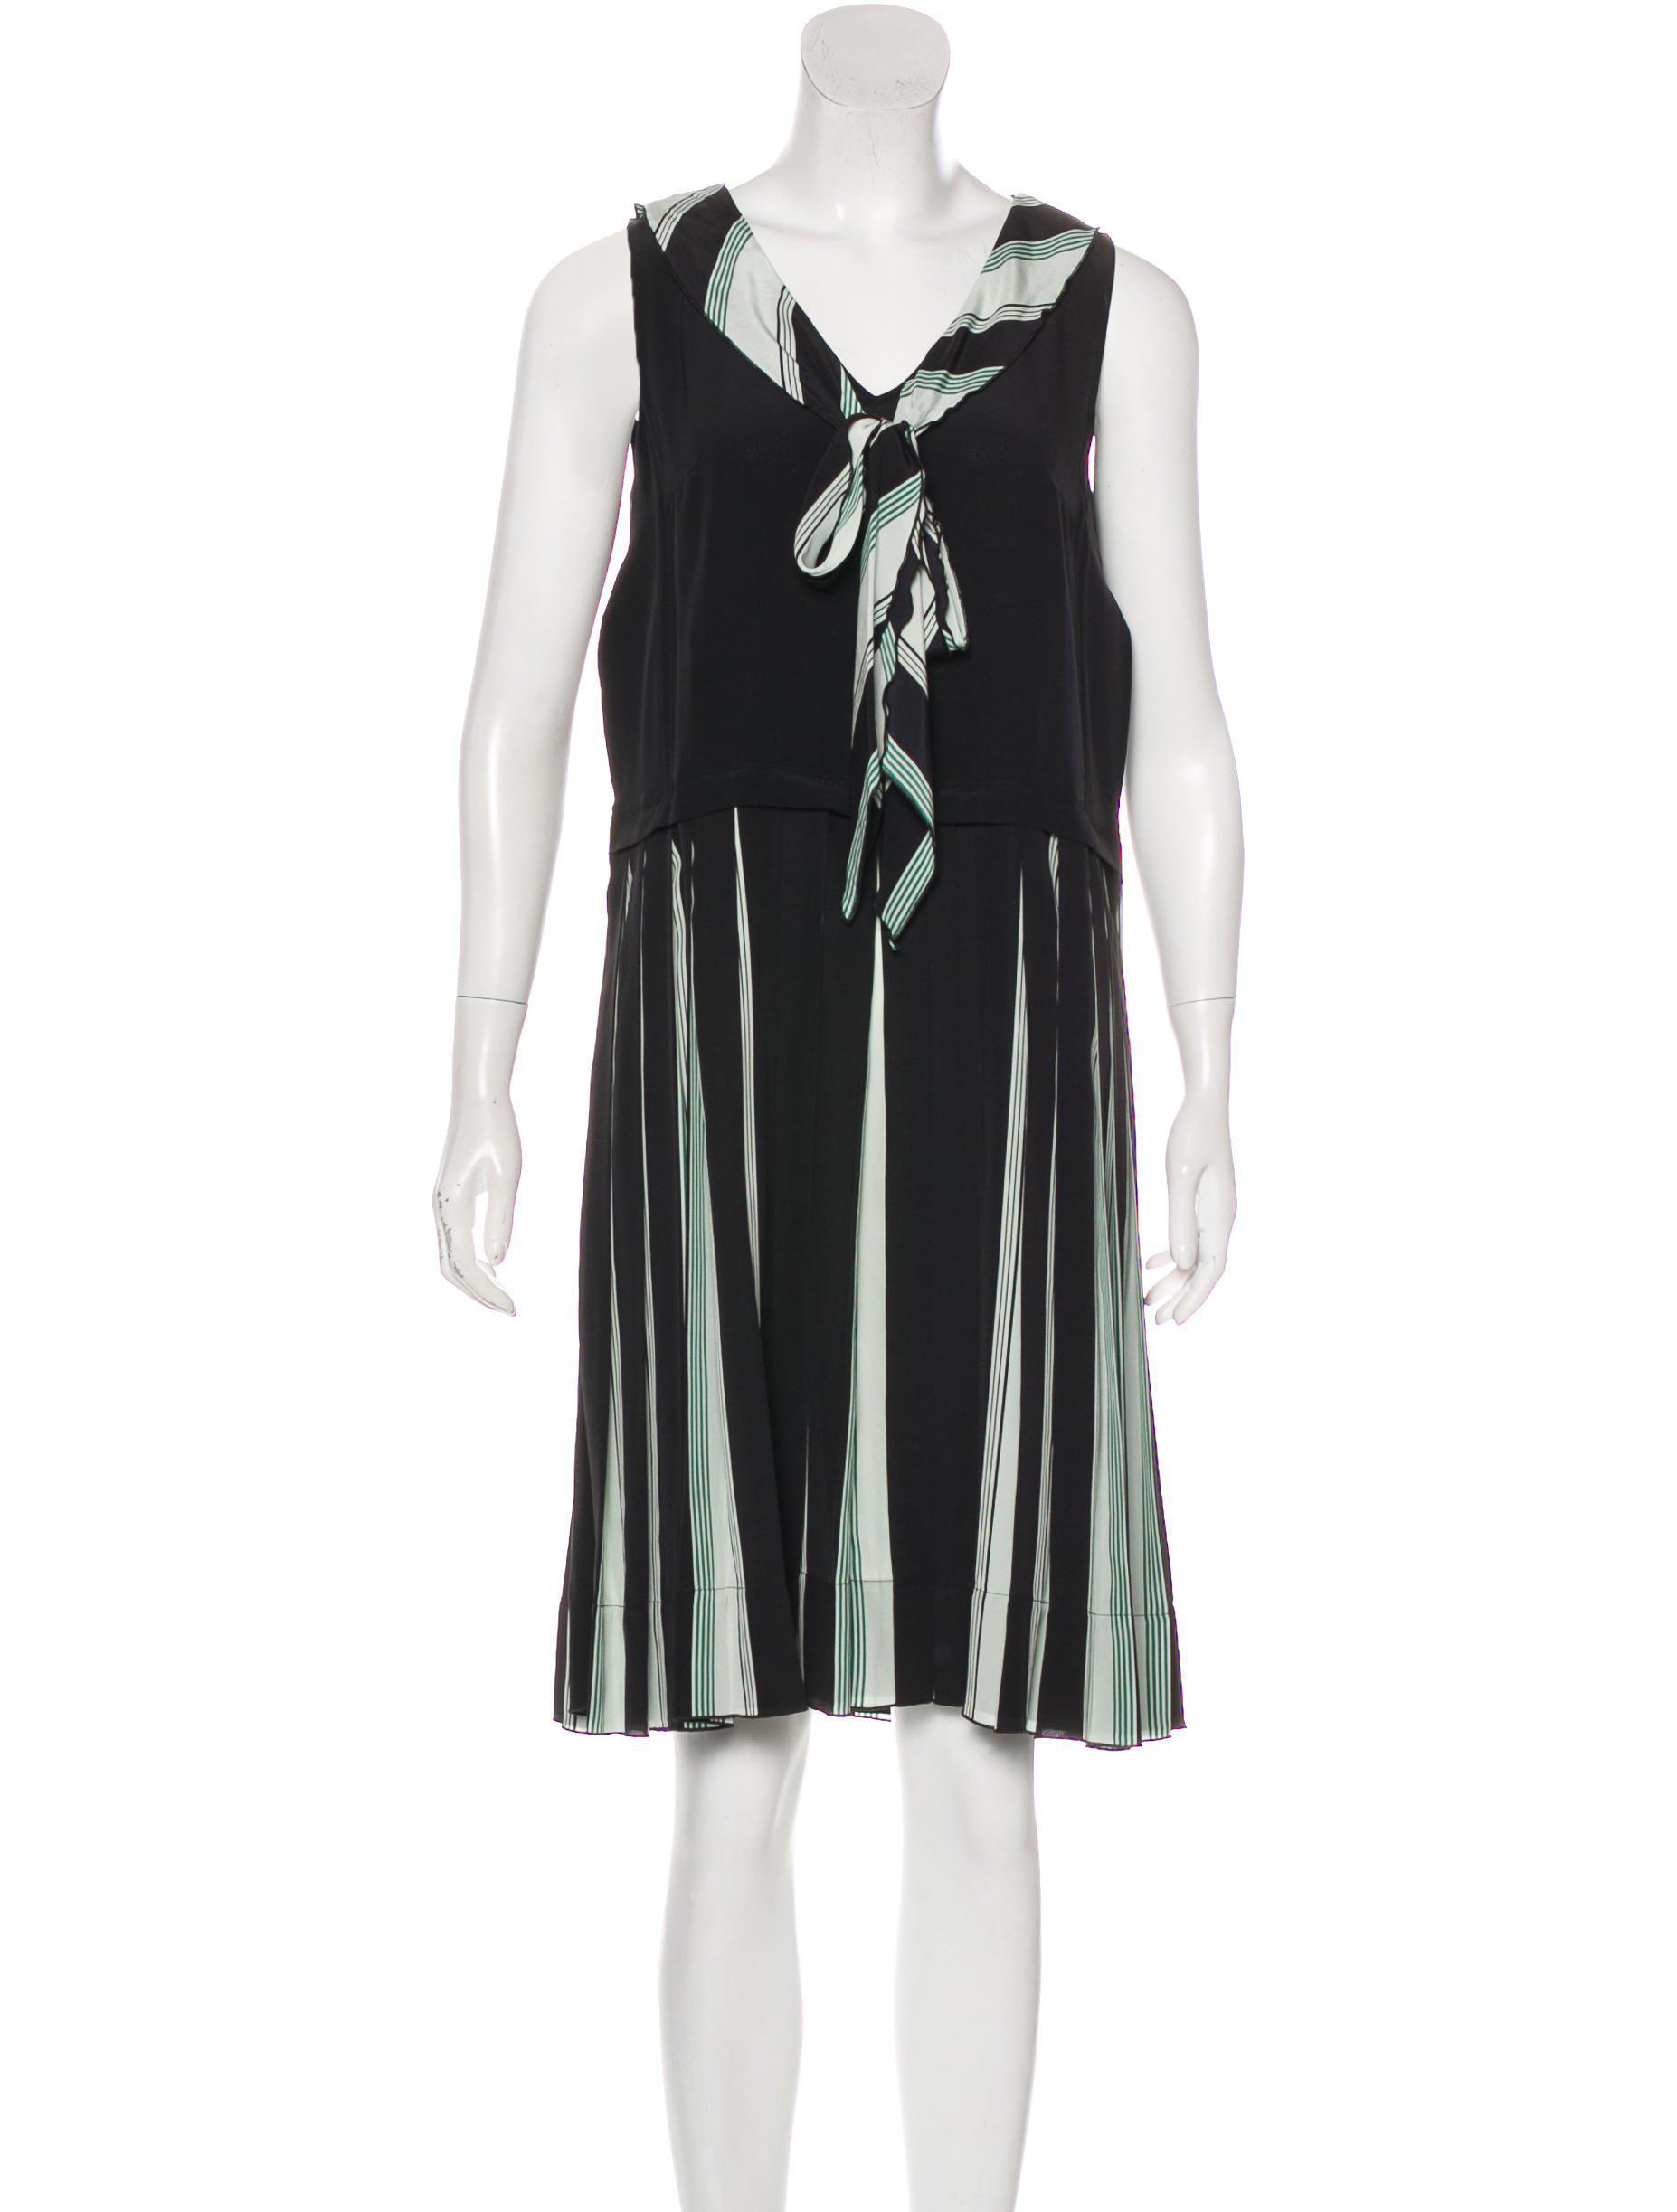 99998e995ed Lyst - Marc Jacobs Sleeveless Silk Dress in Black